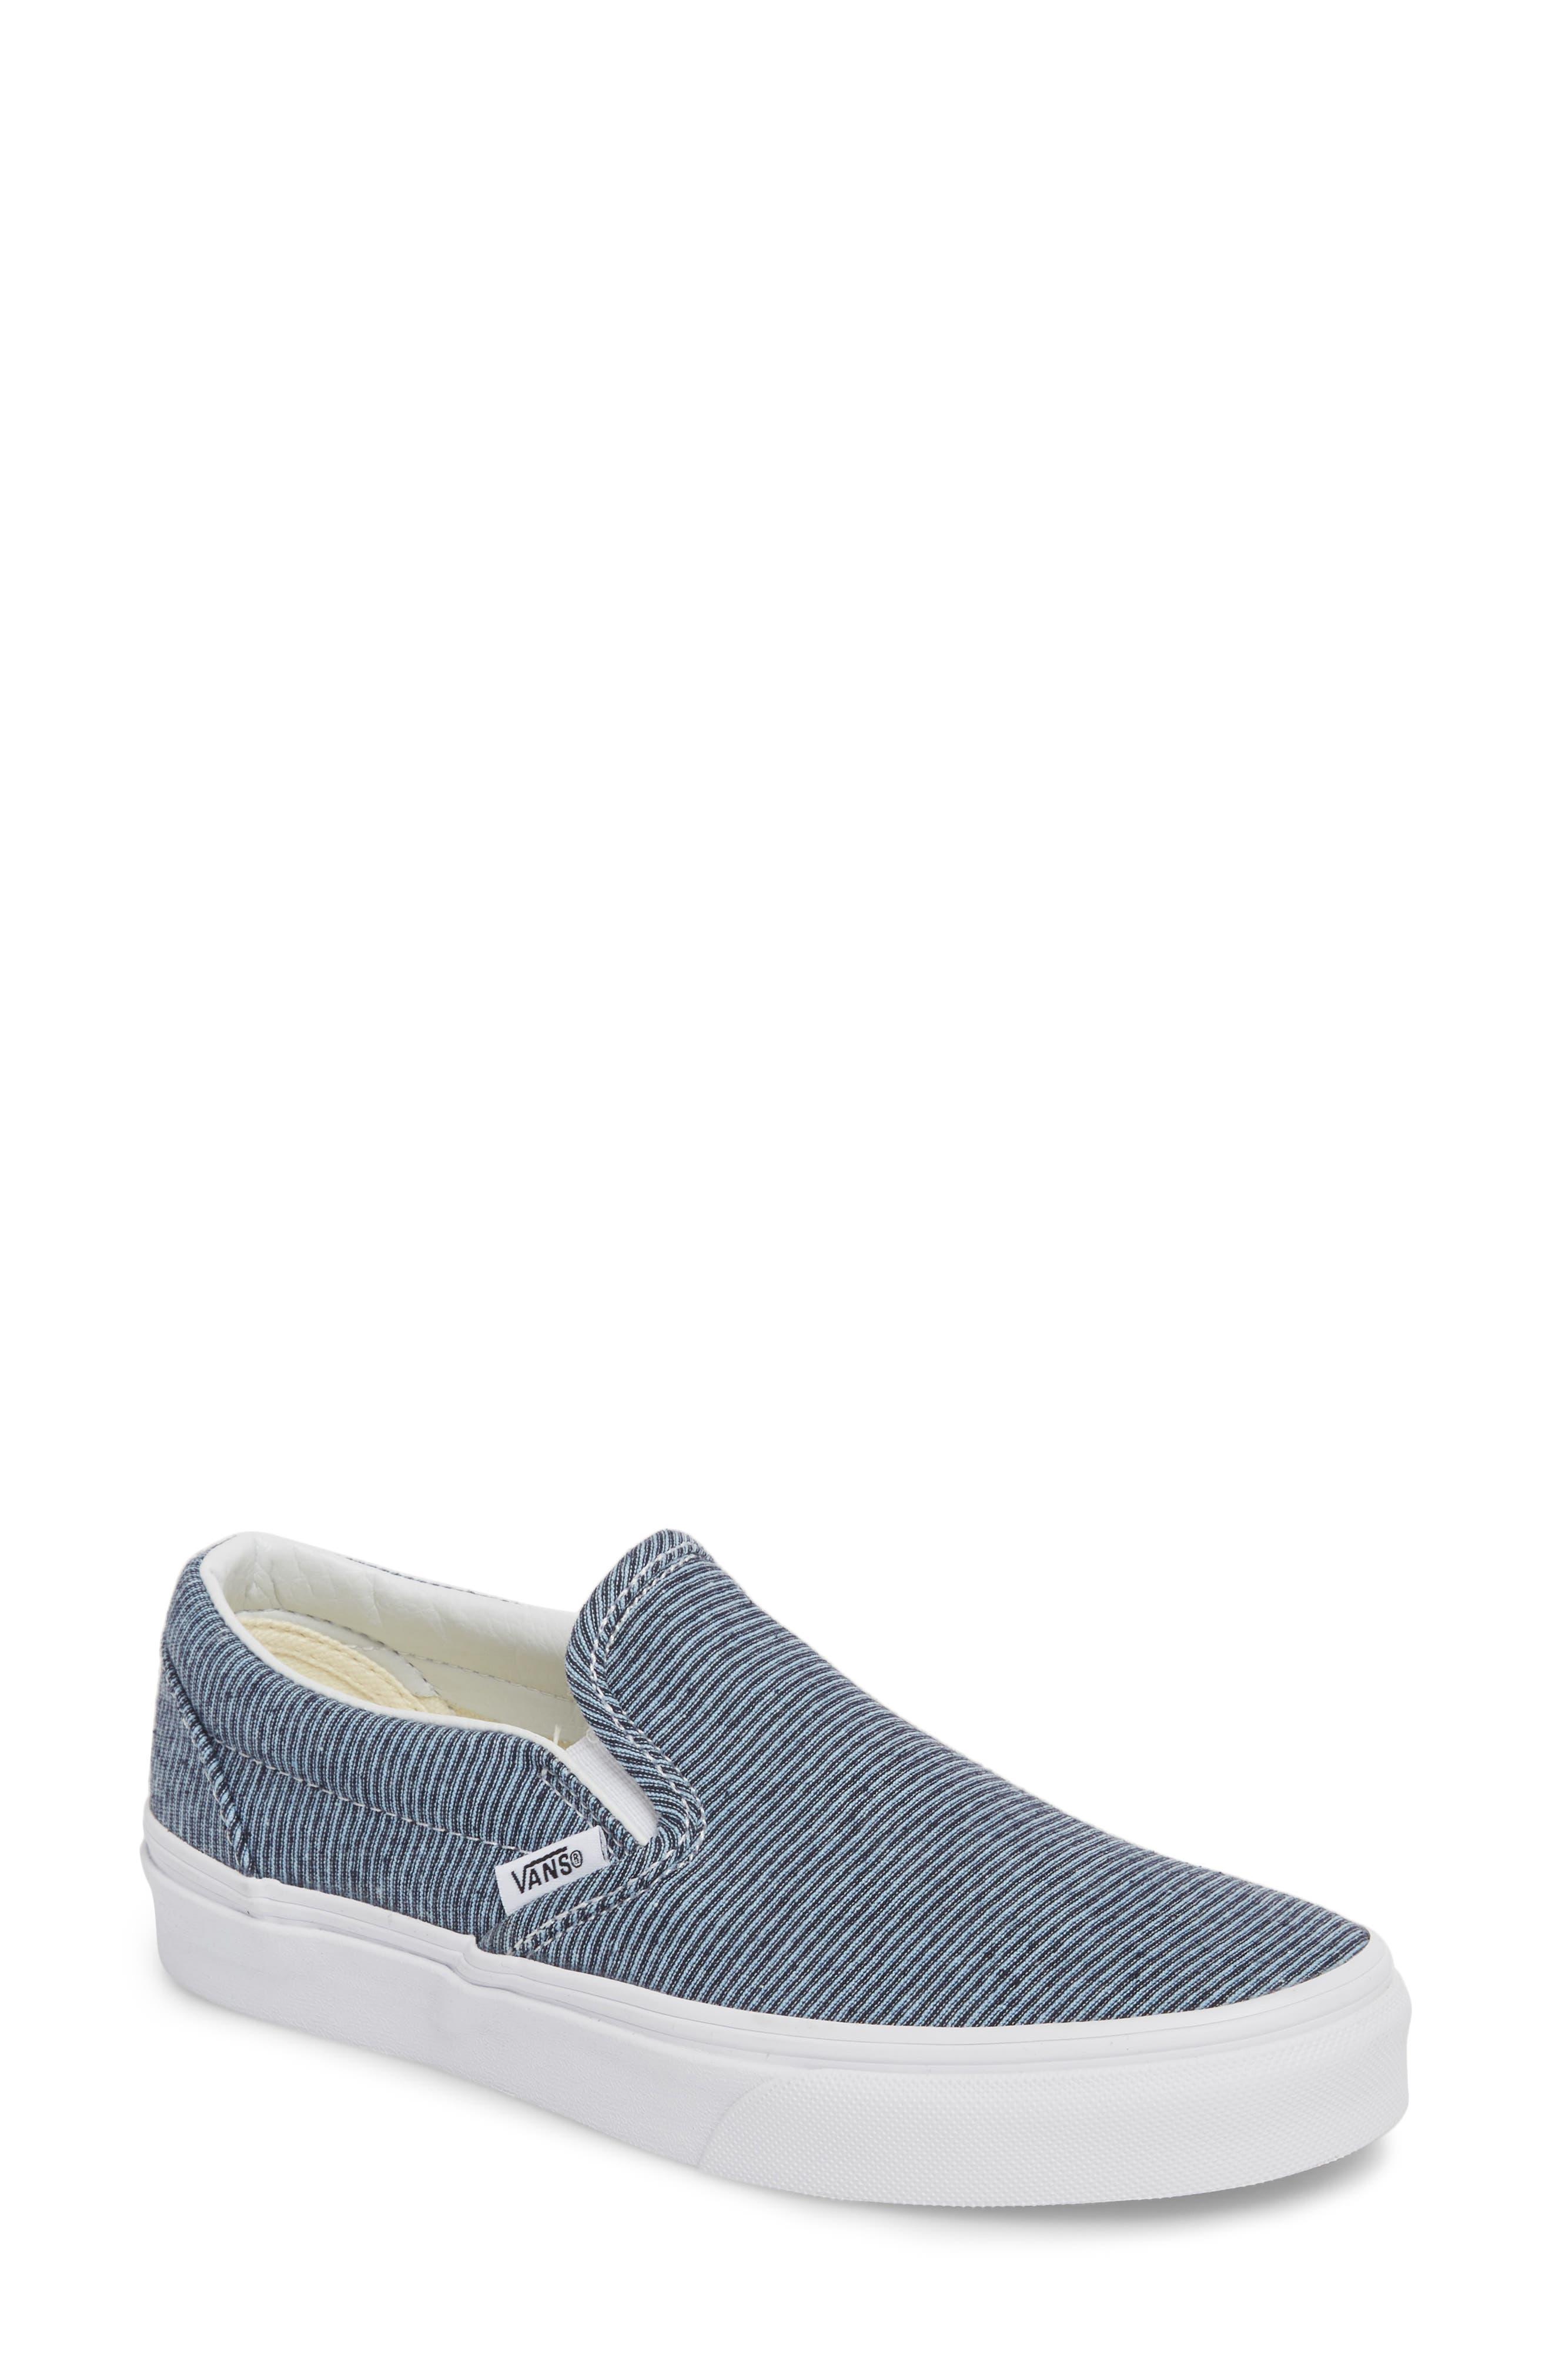 ,                             Classic Slip-On Sneaker,                             Main thumbnail 153, color,                             422